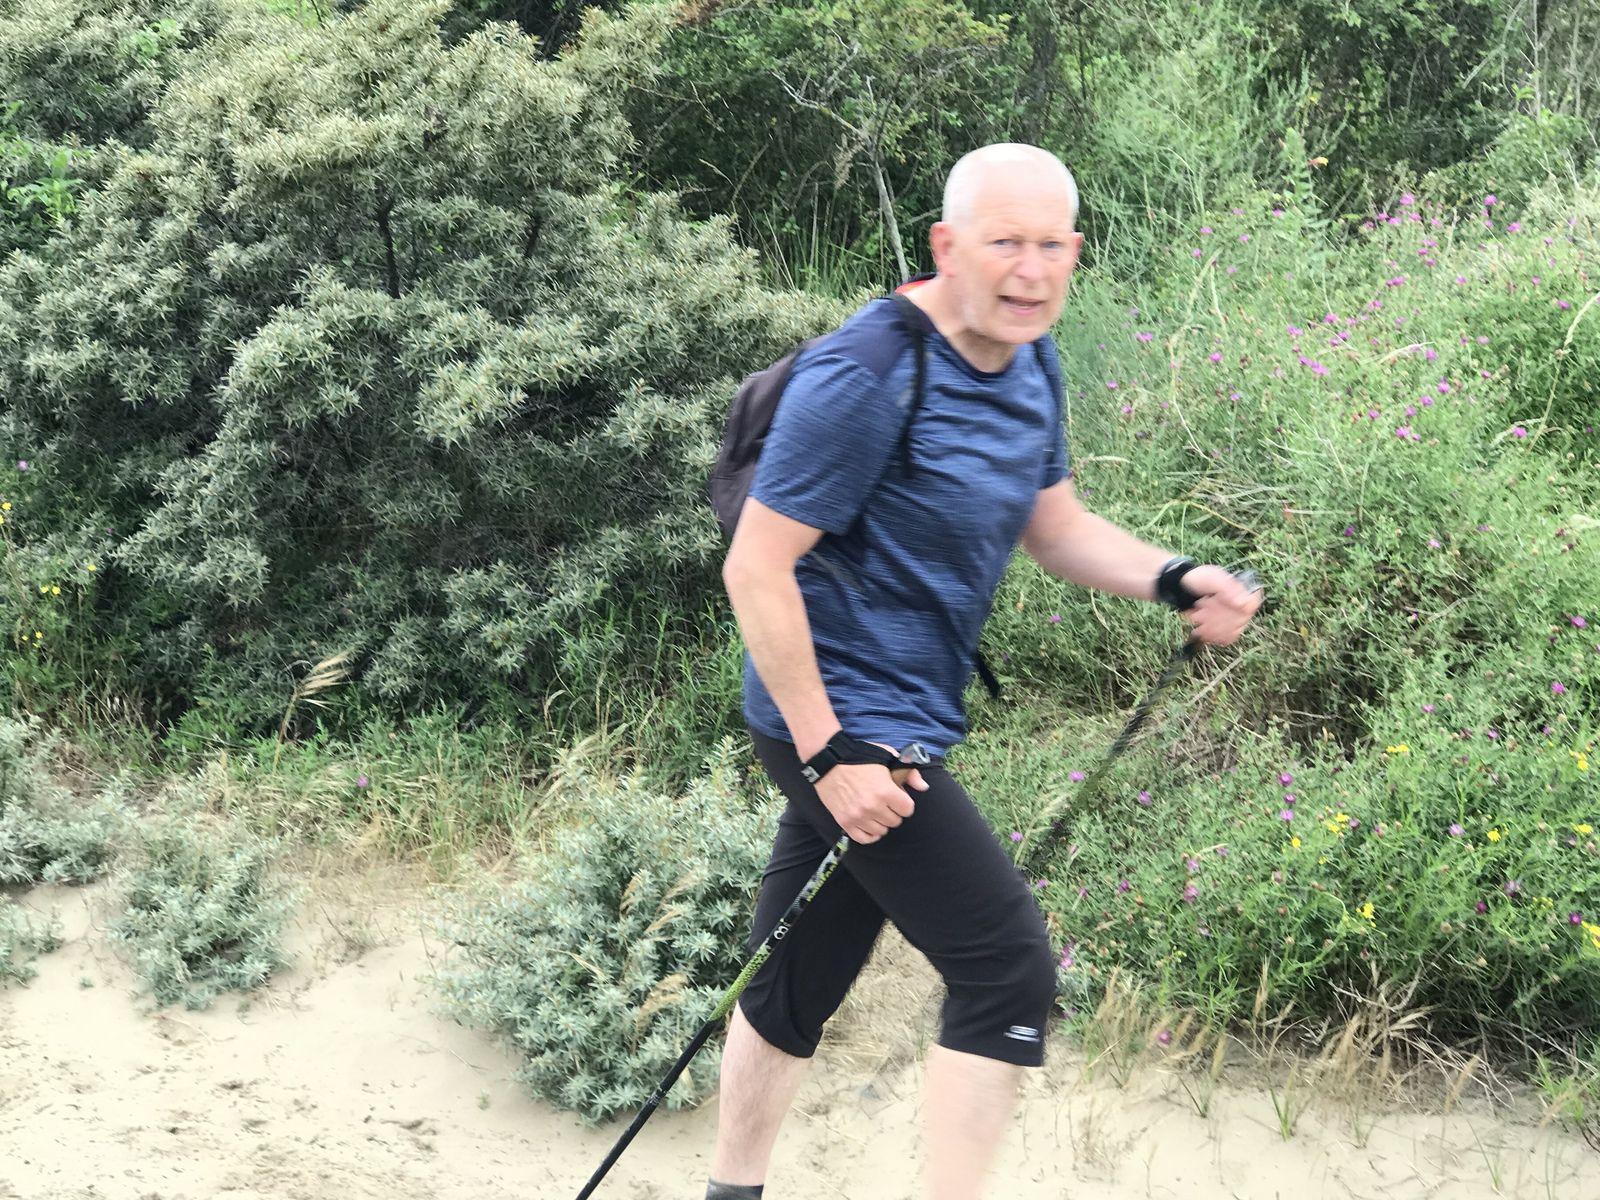 Sortie dans la dune Dewulf le dimanche 5 juillet